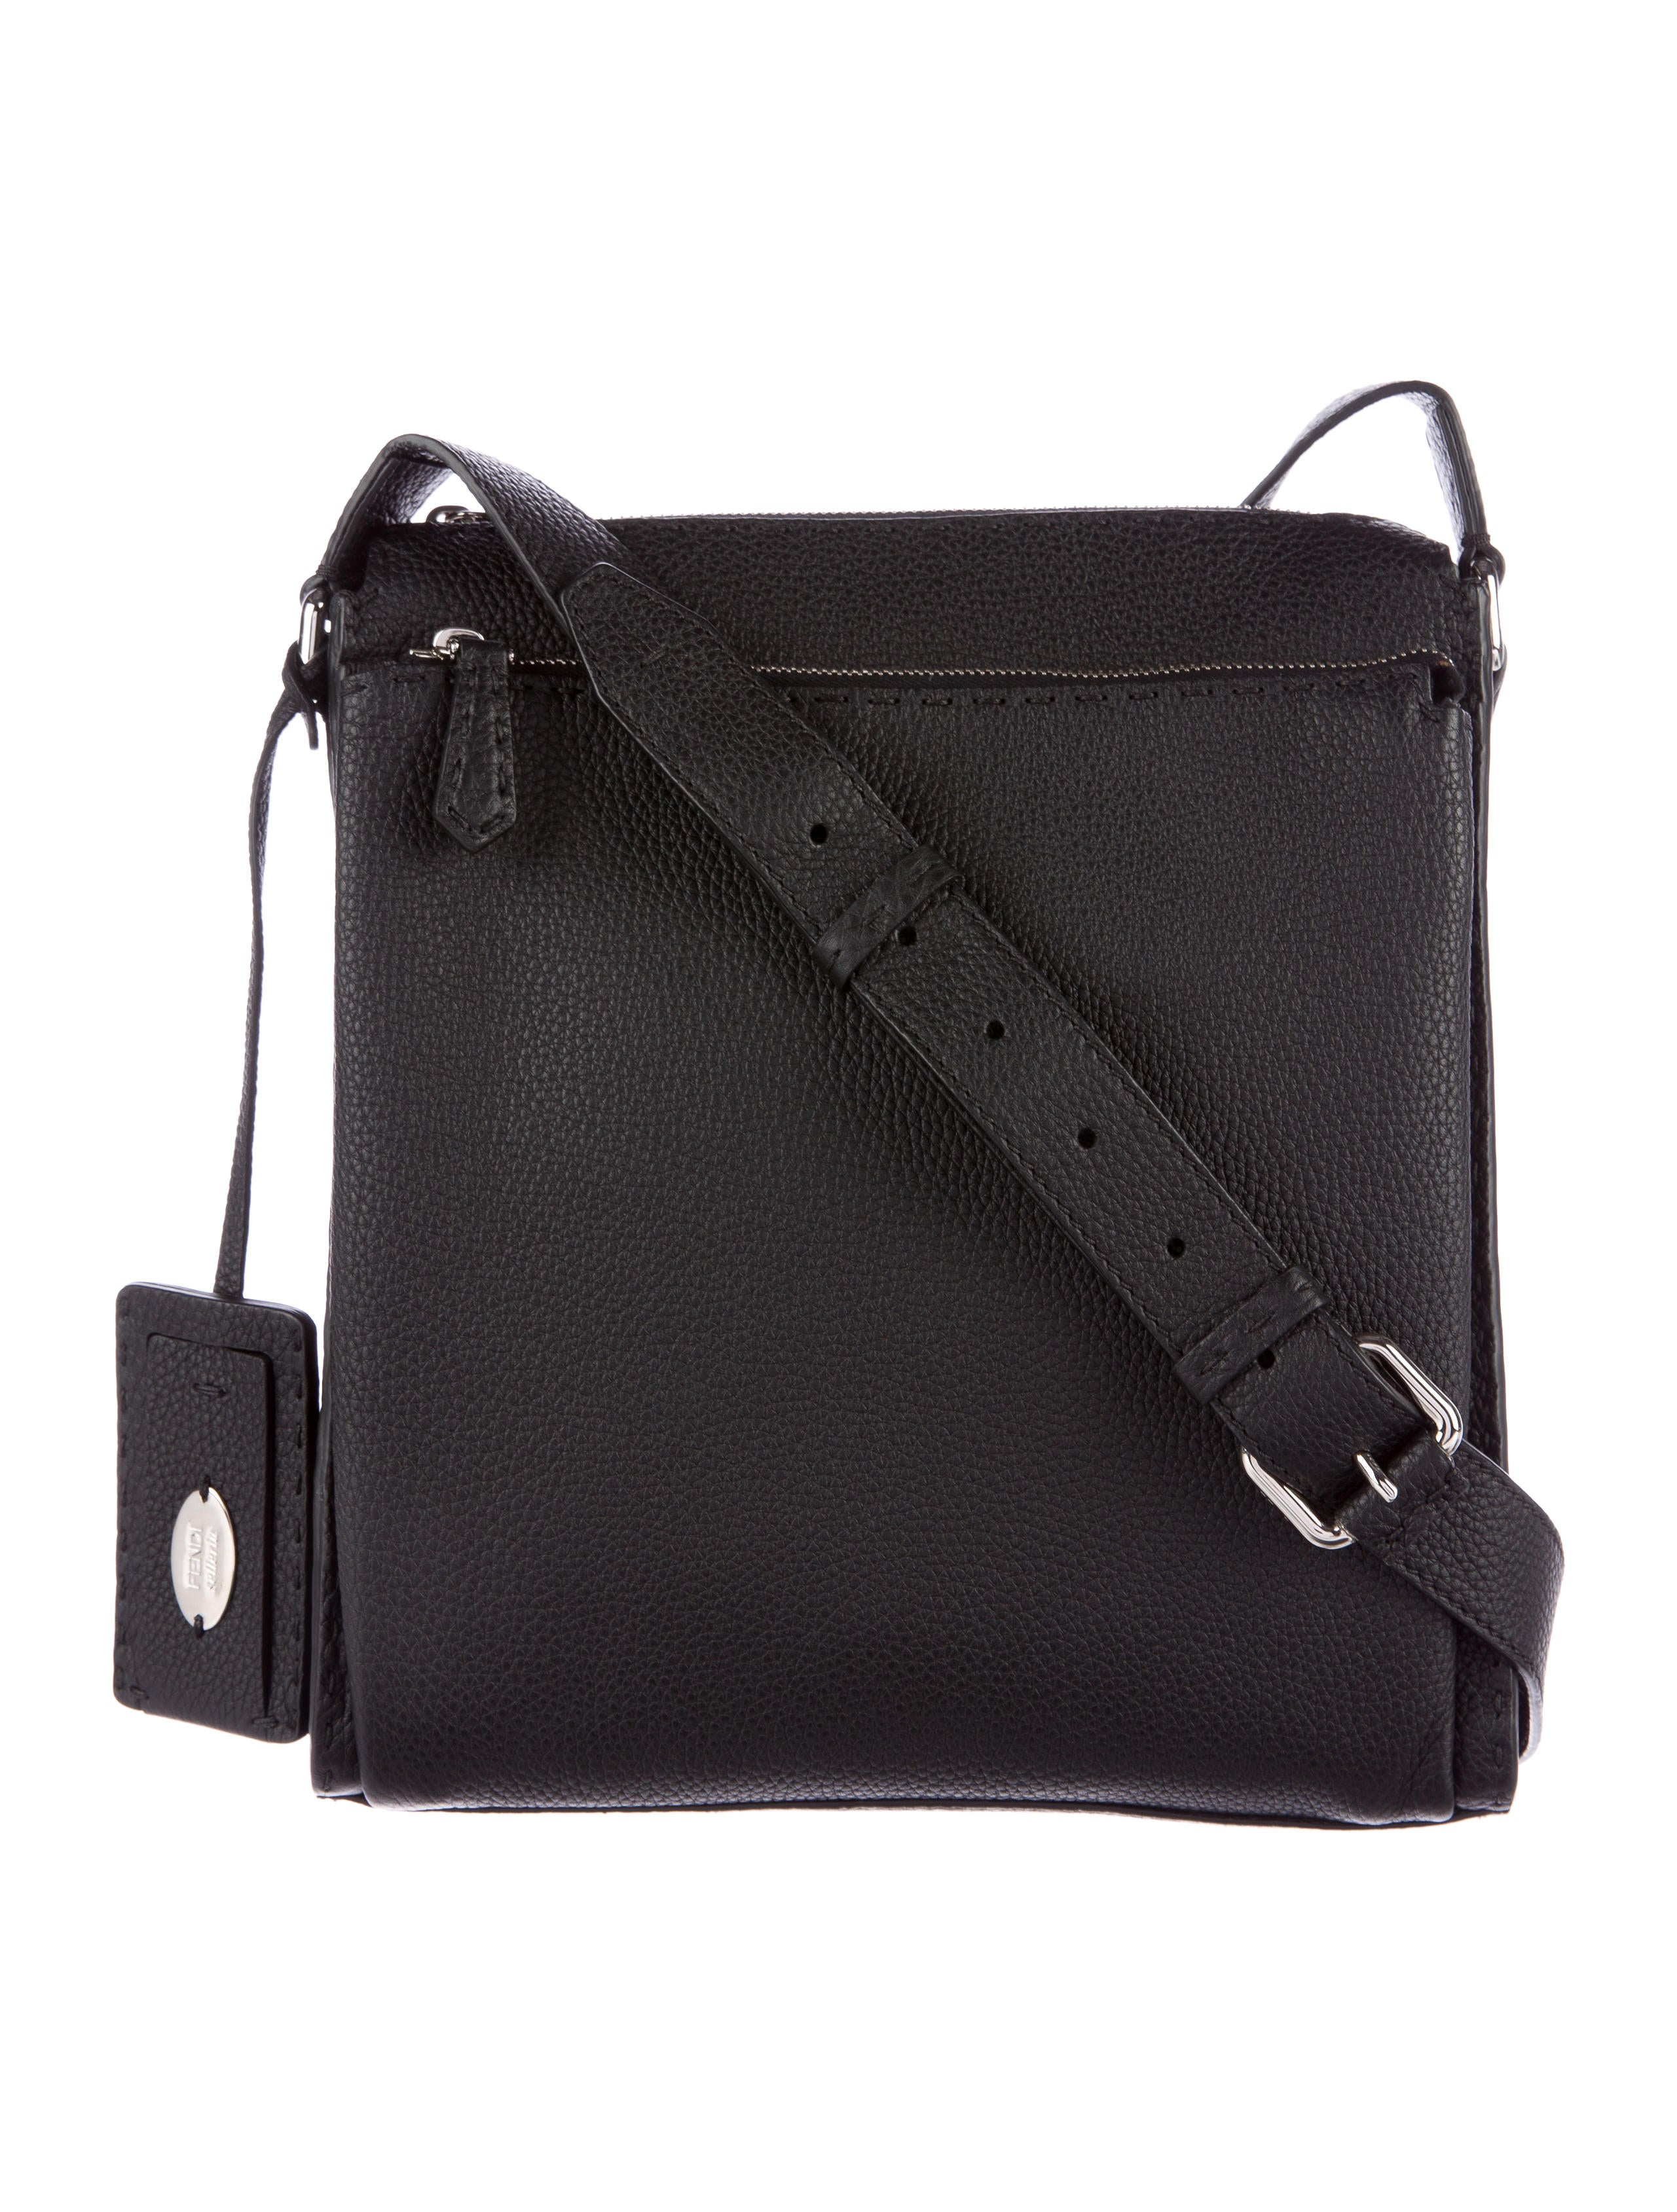 42476c692b7 Fendi Leather Selleria Messenger - Bags - FEN48027   The RealReal